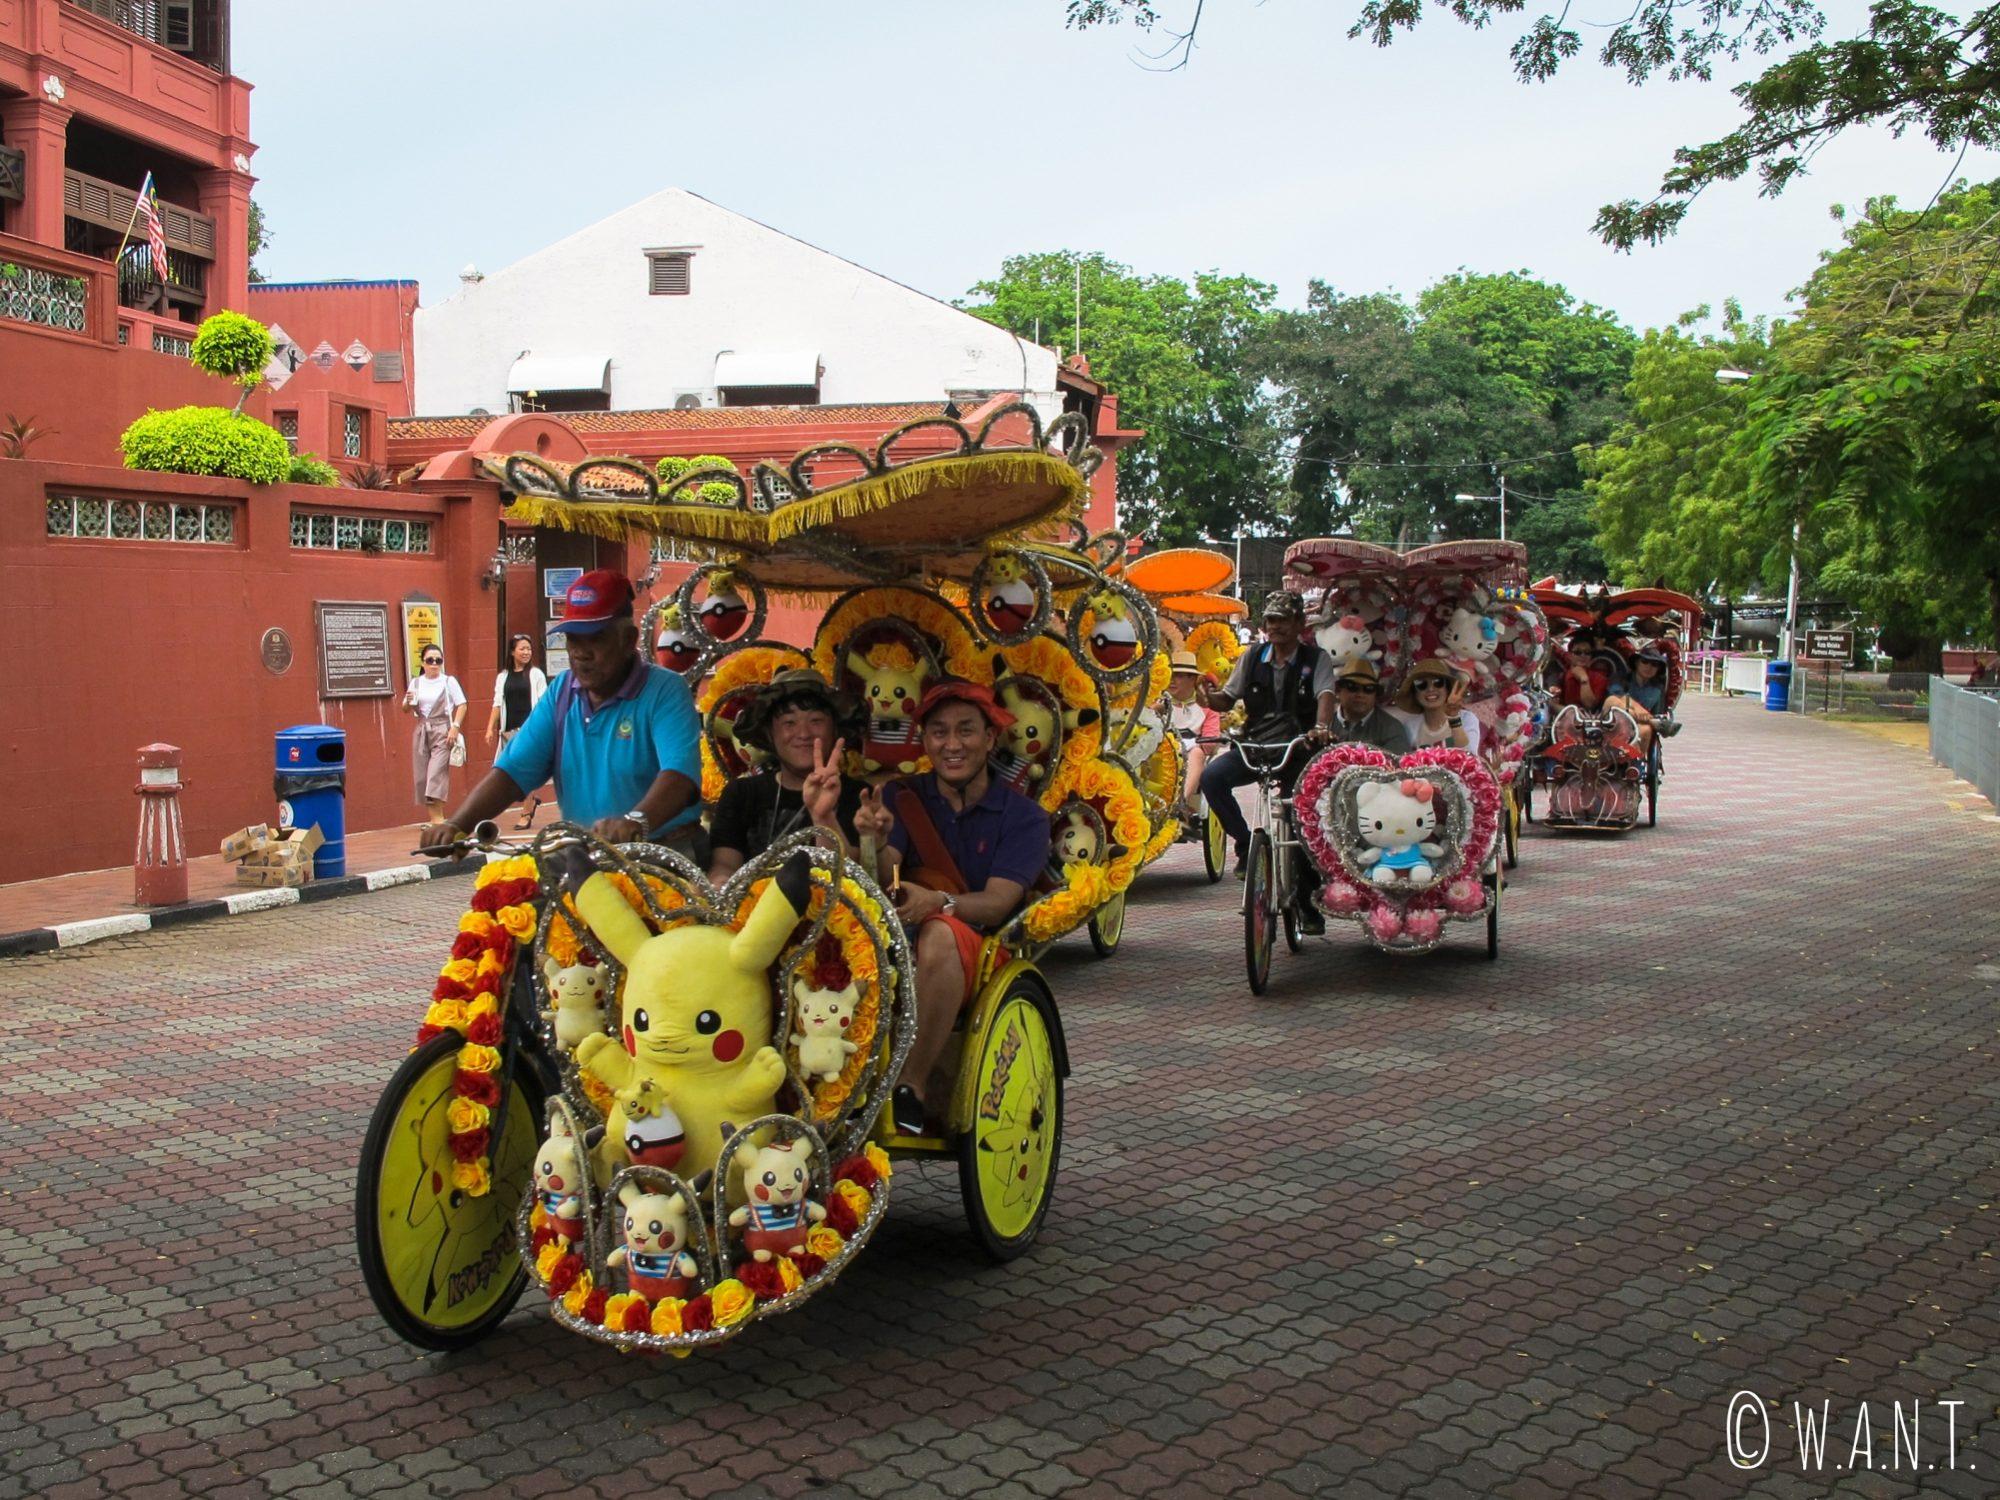 Horde de tuk-tuks dans les rues du centre historique de Malacca